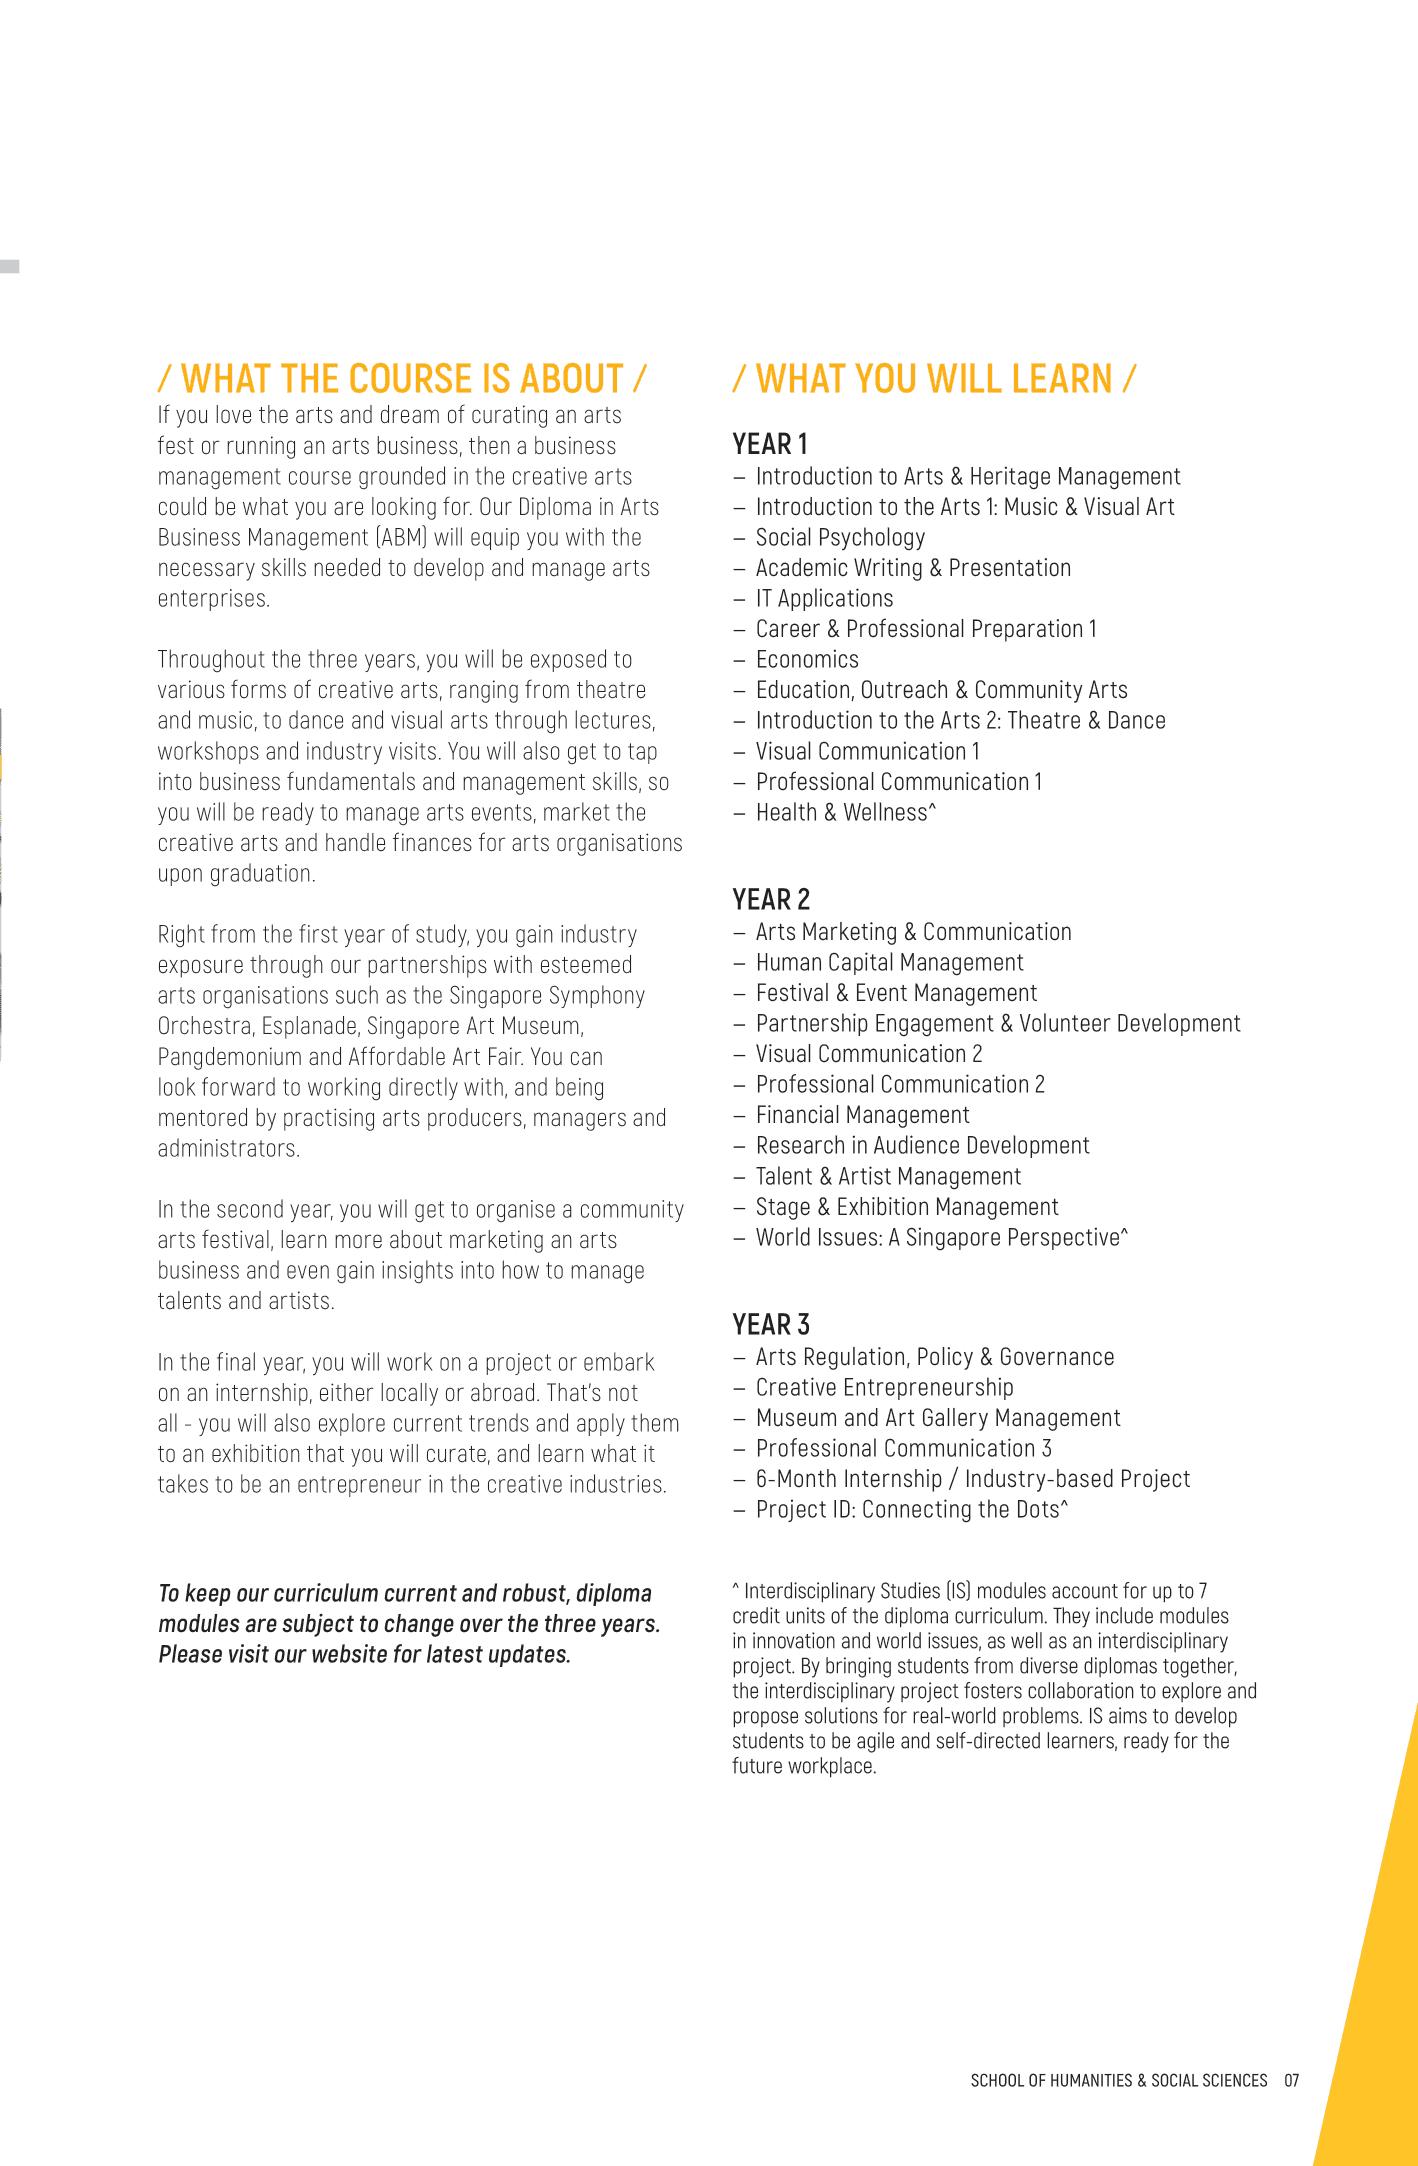 School of Humanities & Social Sciences 2020-09